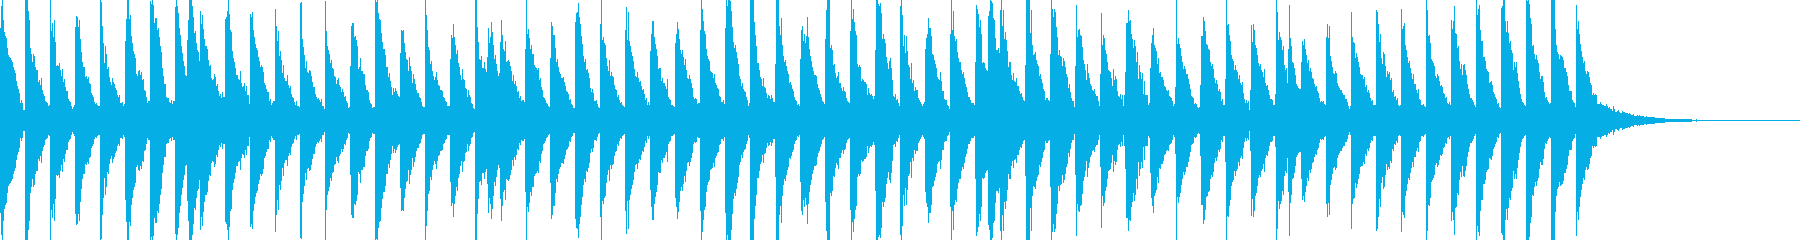 EDM  Drop フレーズですの再生済みの波形